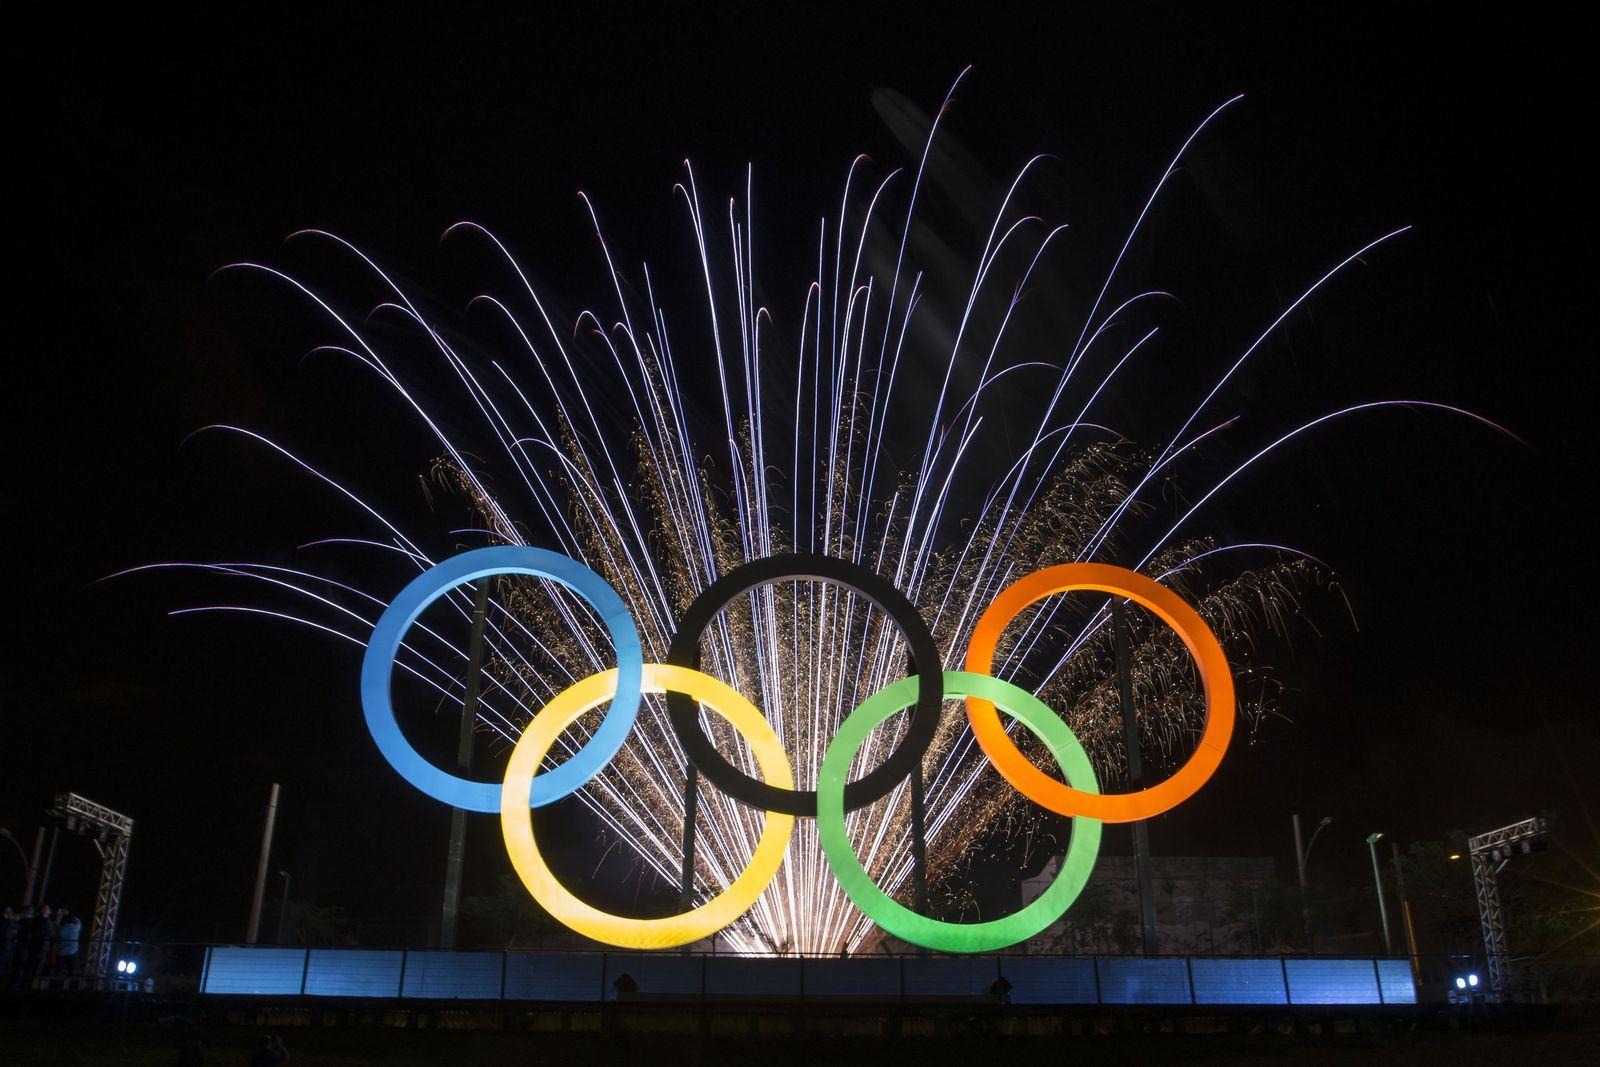 Rio Olympia